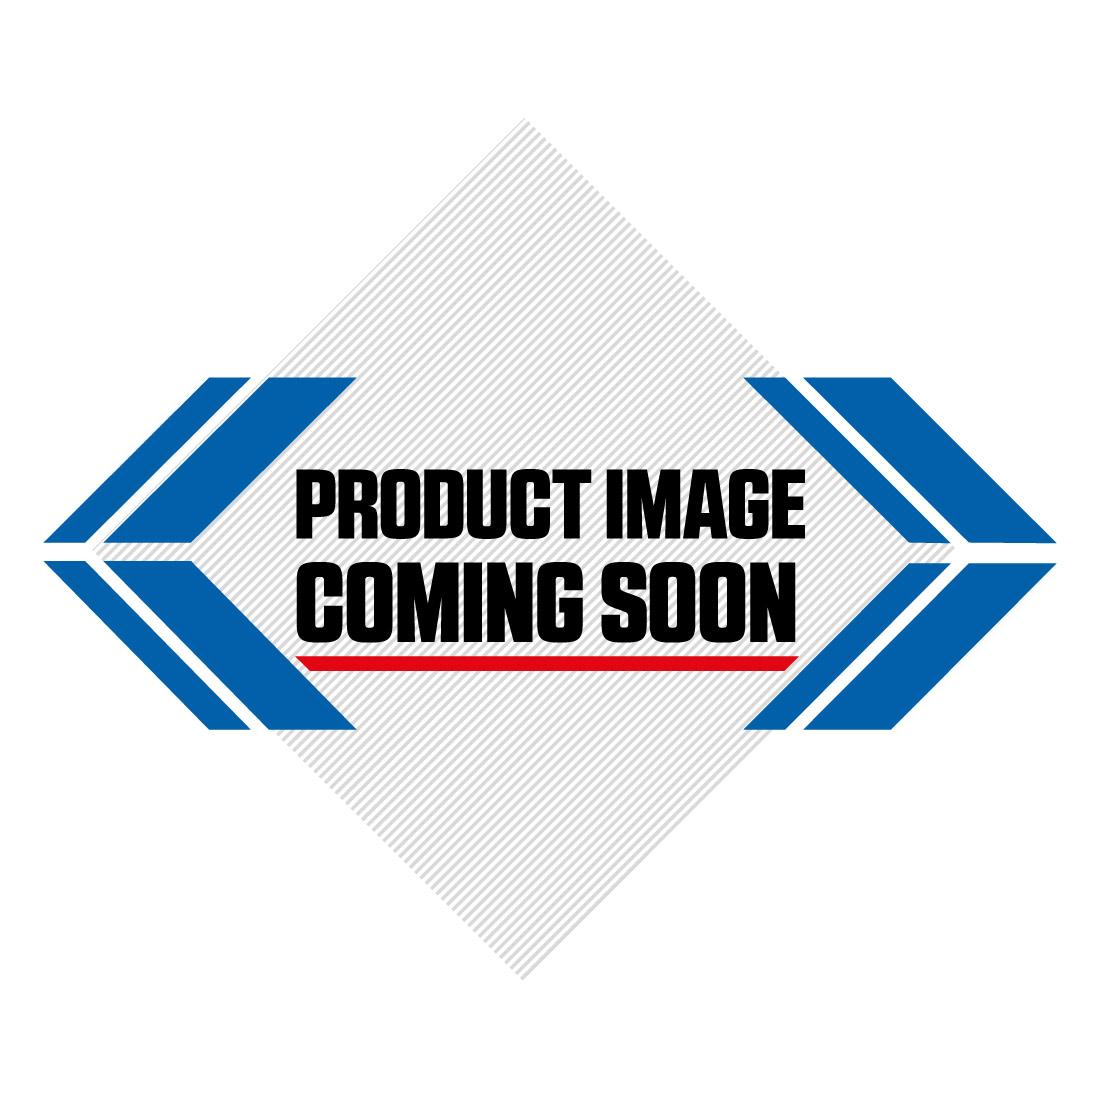 Honda Plastic Kit CRF 230 (08-14) OEM Factory Image-0